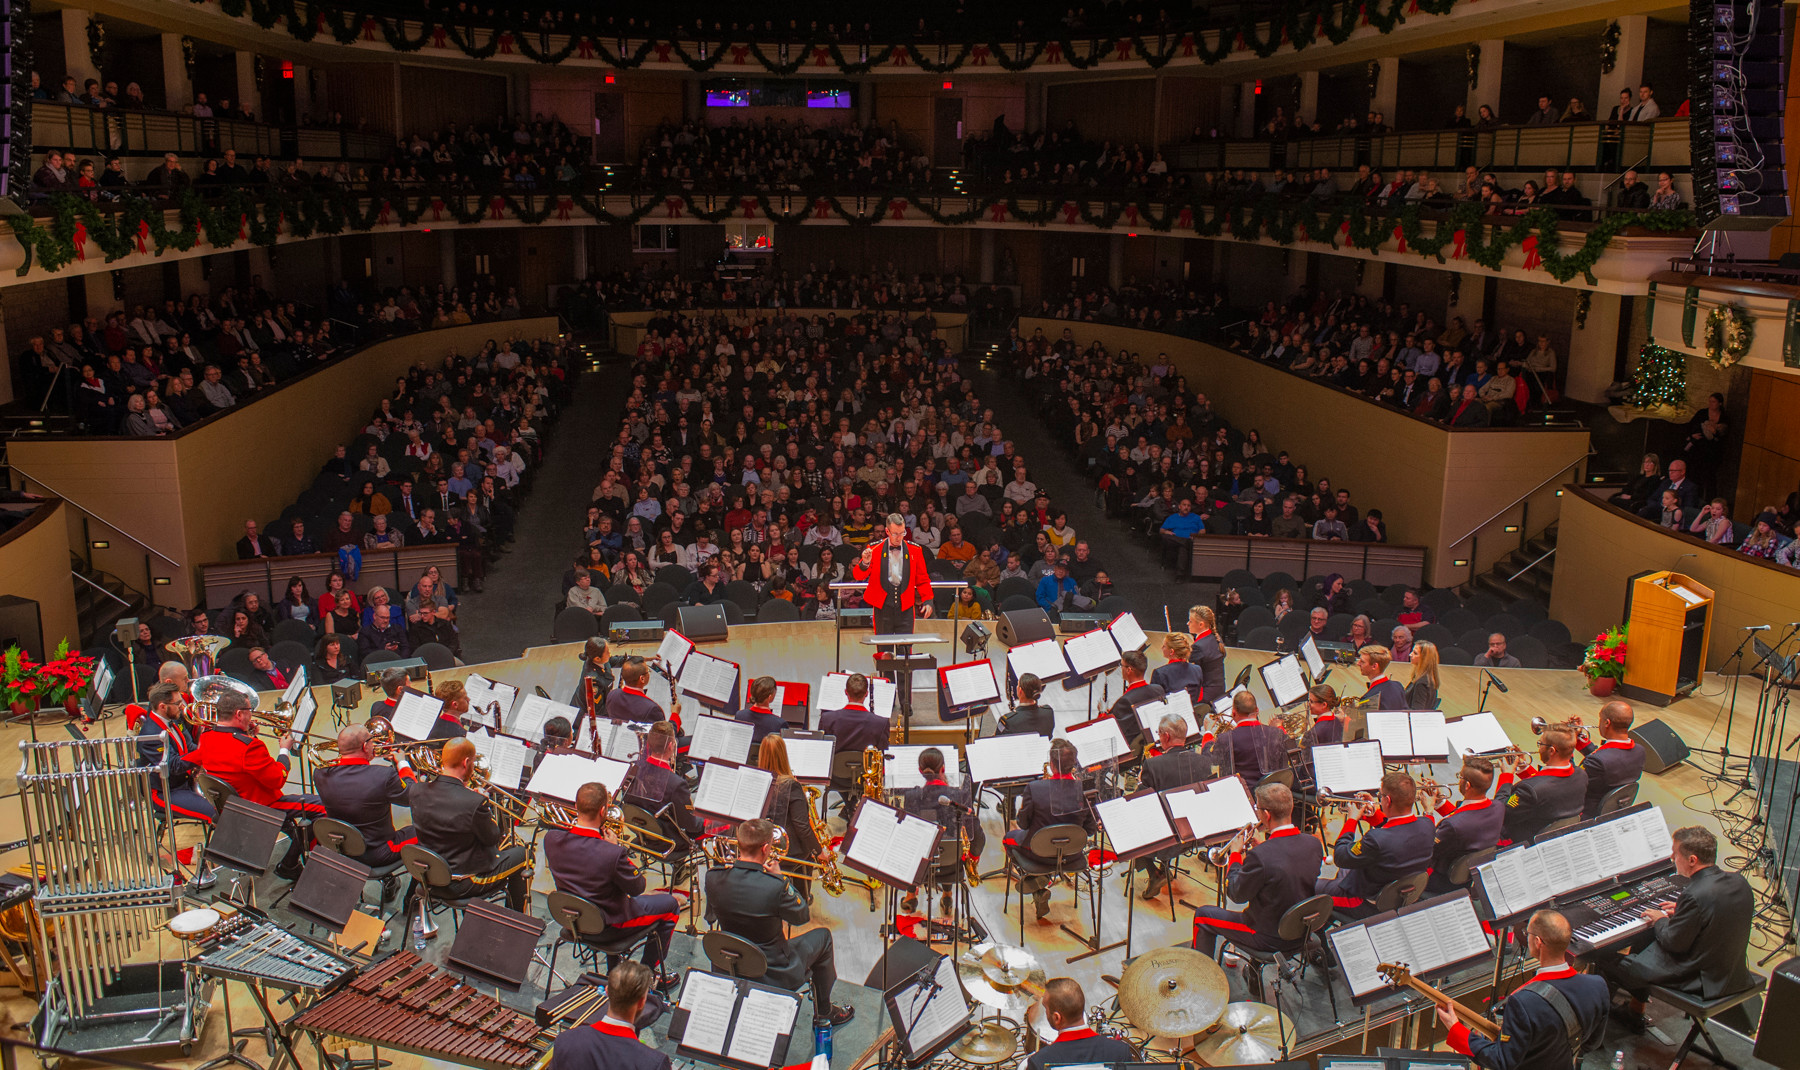 2019 Christmas Concert Winspear Center E